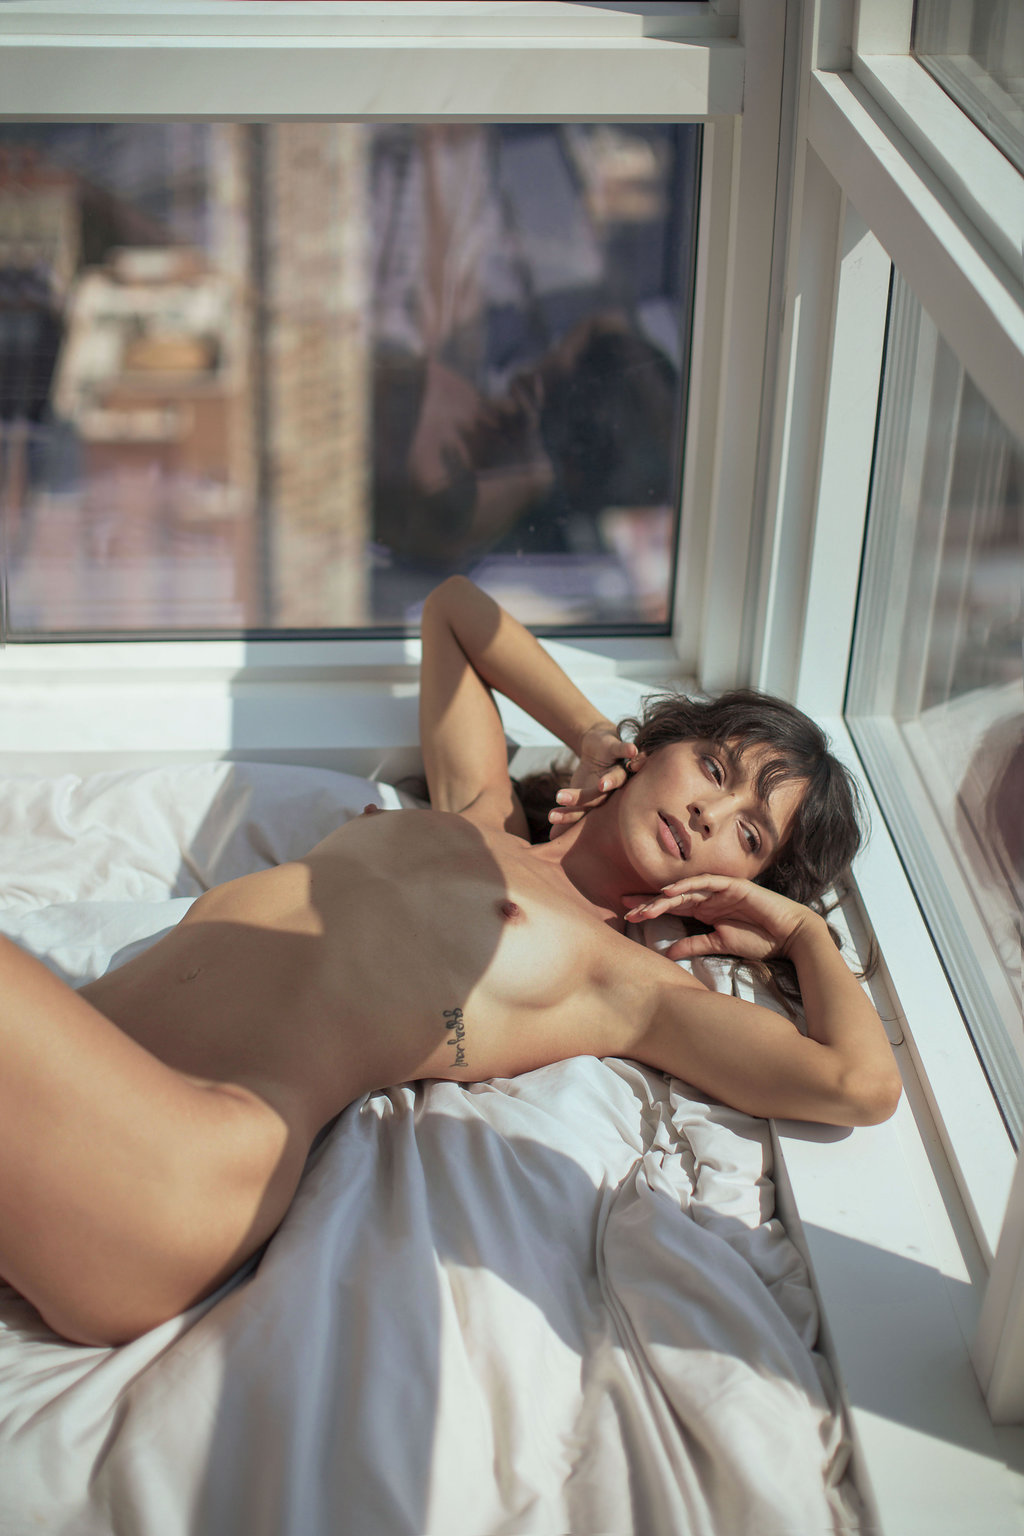 Jen_Senn_Erica_Candice_Playboy_-1675.jpg